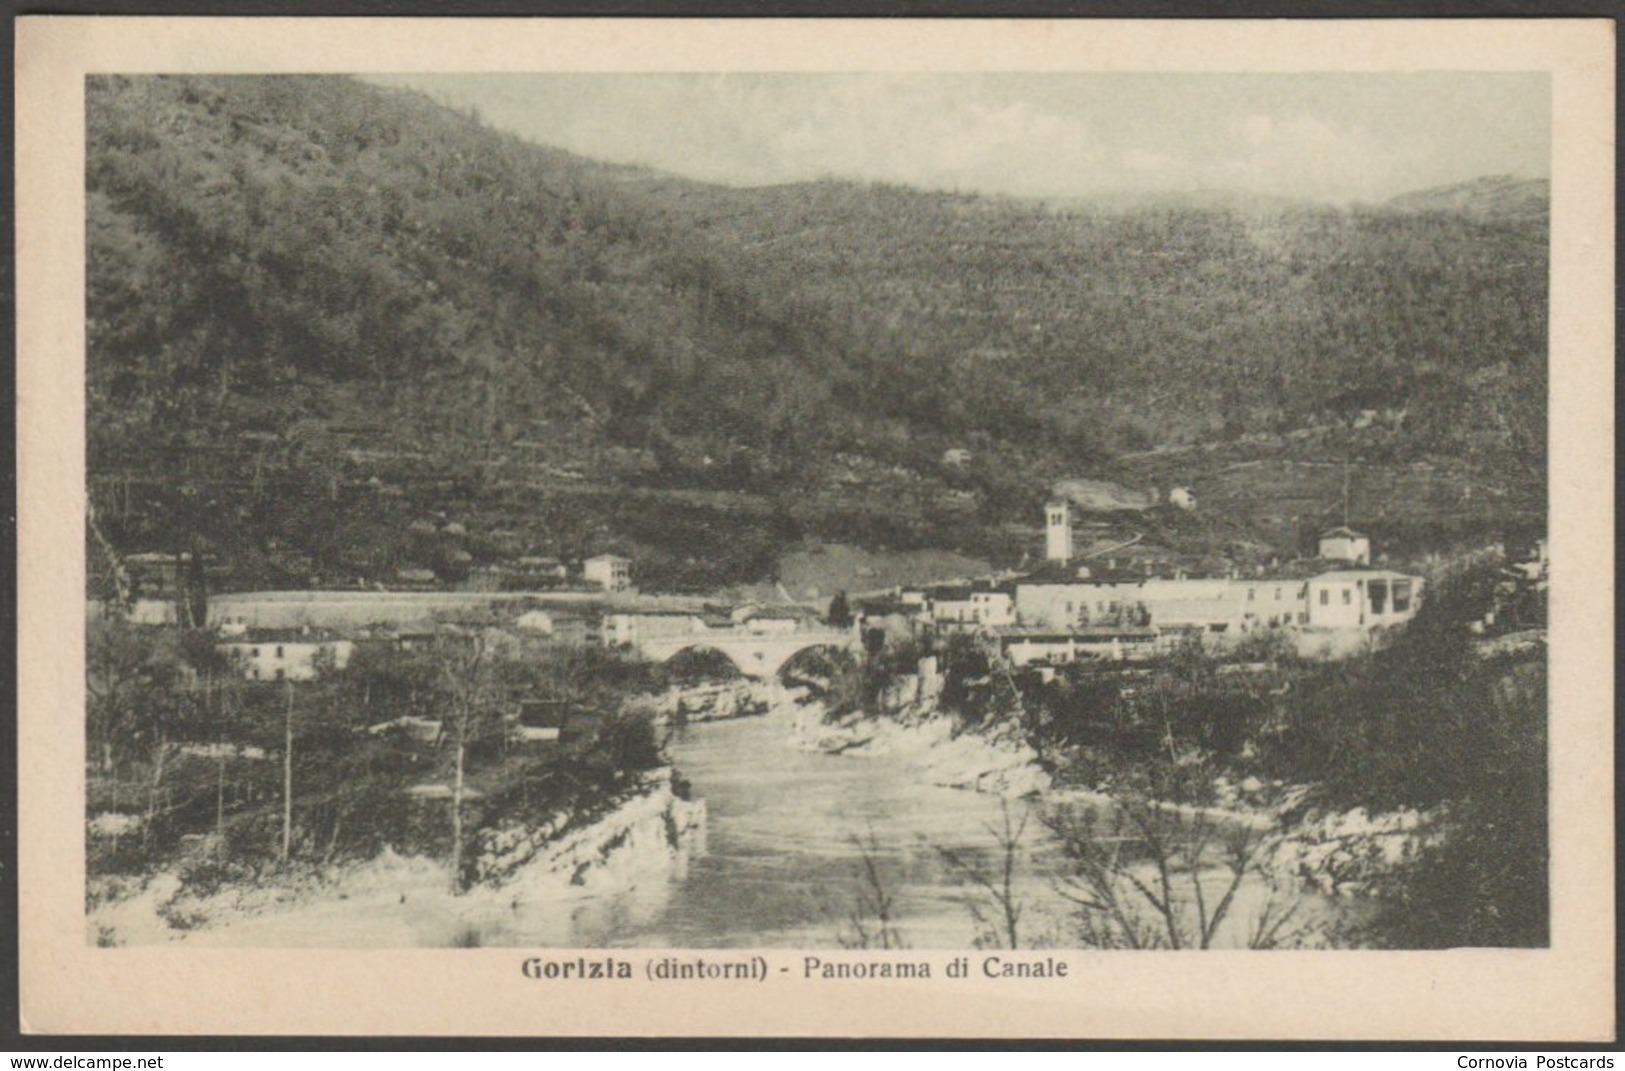 Panorama Di Canale, Gorizia, Friuli, C.1910s - Alterocca Cartolina - Slovenia